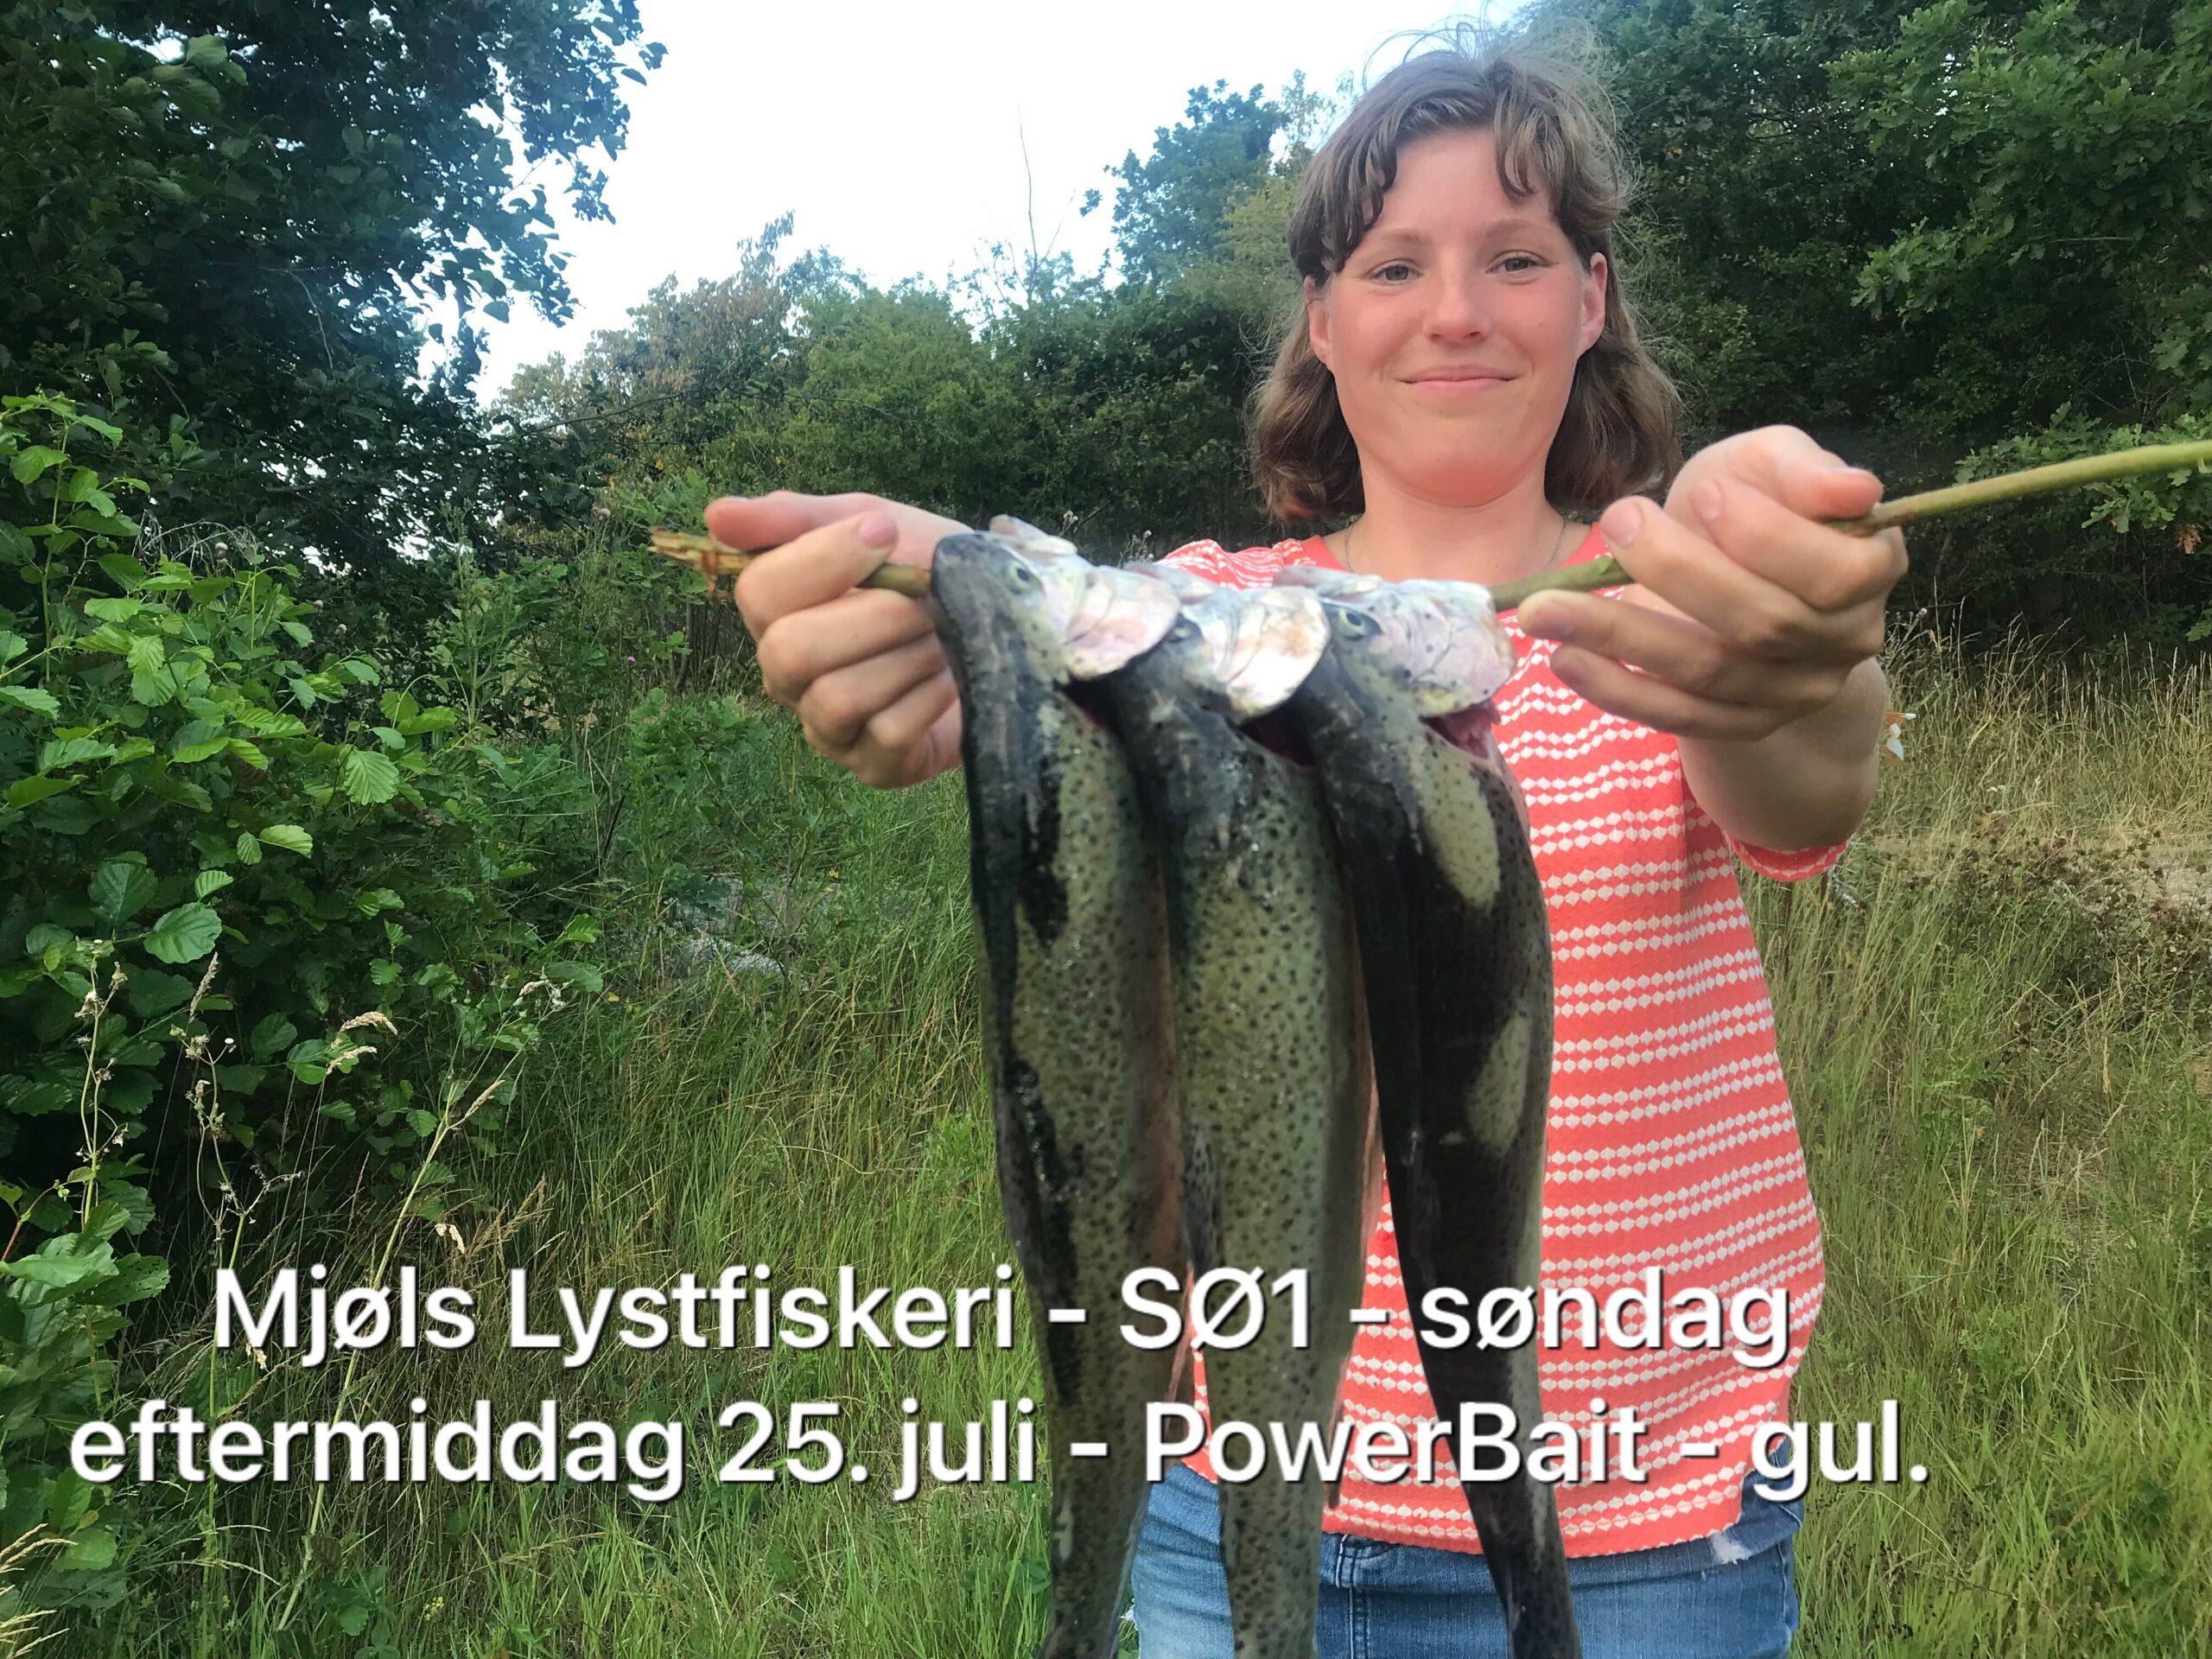 Sara Eggert fangede selv aftensmaden